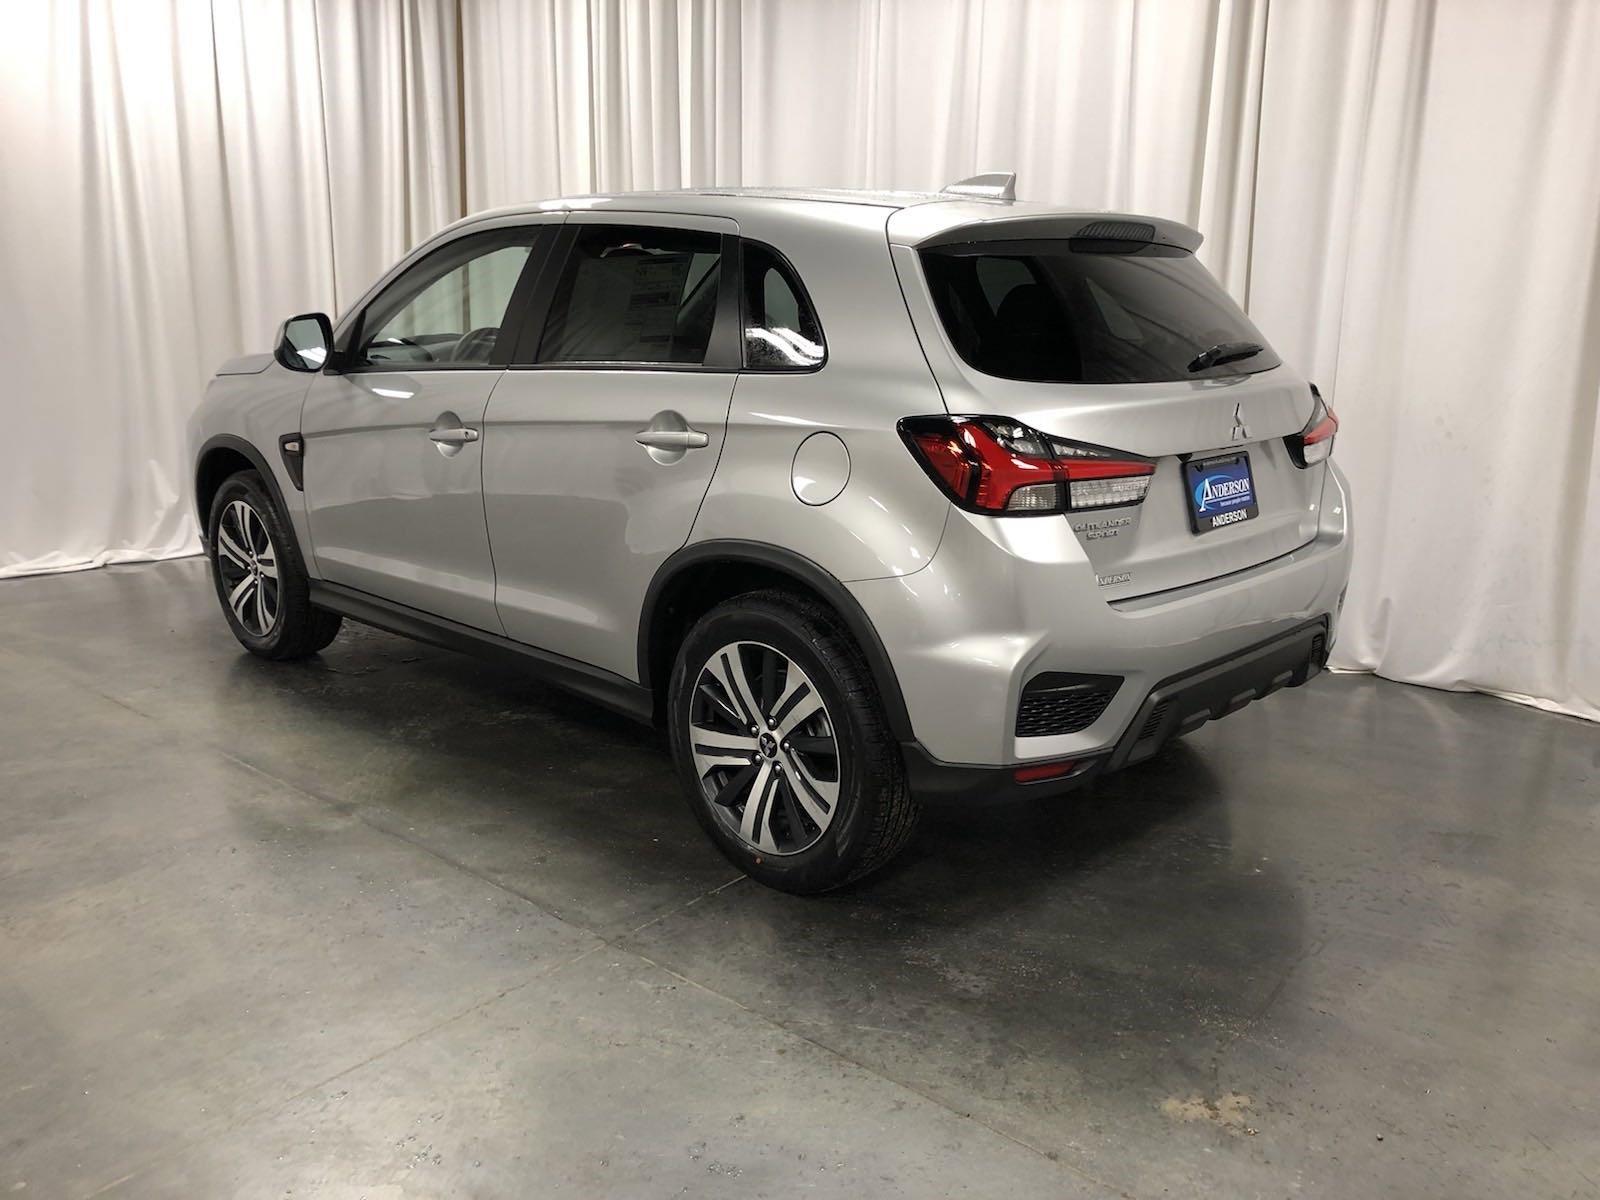 New 2020 Mitsubishi Outlander Sport ES 2.0 Sport Utility for sale in St Joseph MO